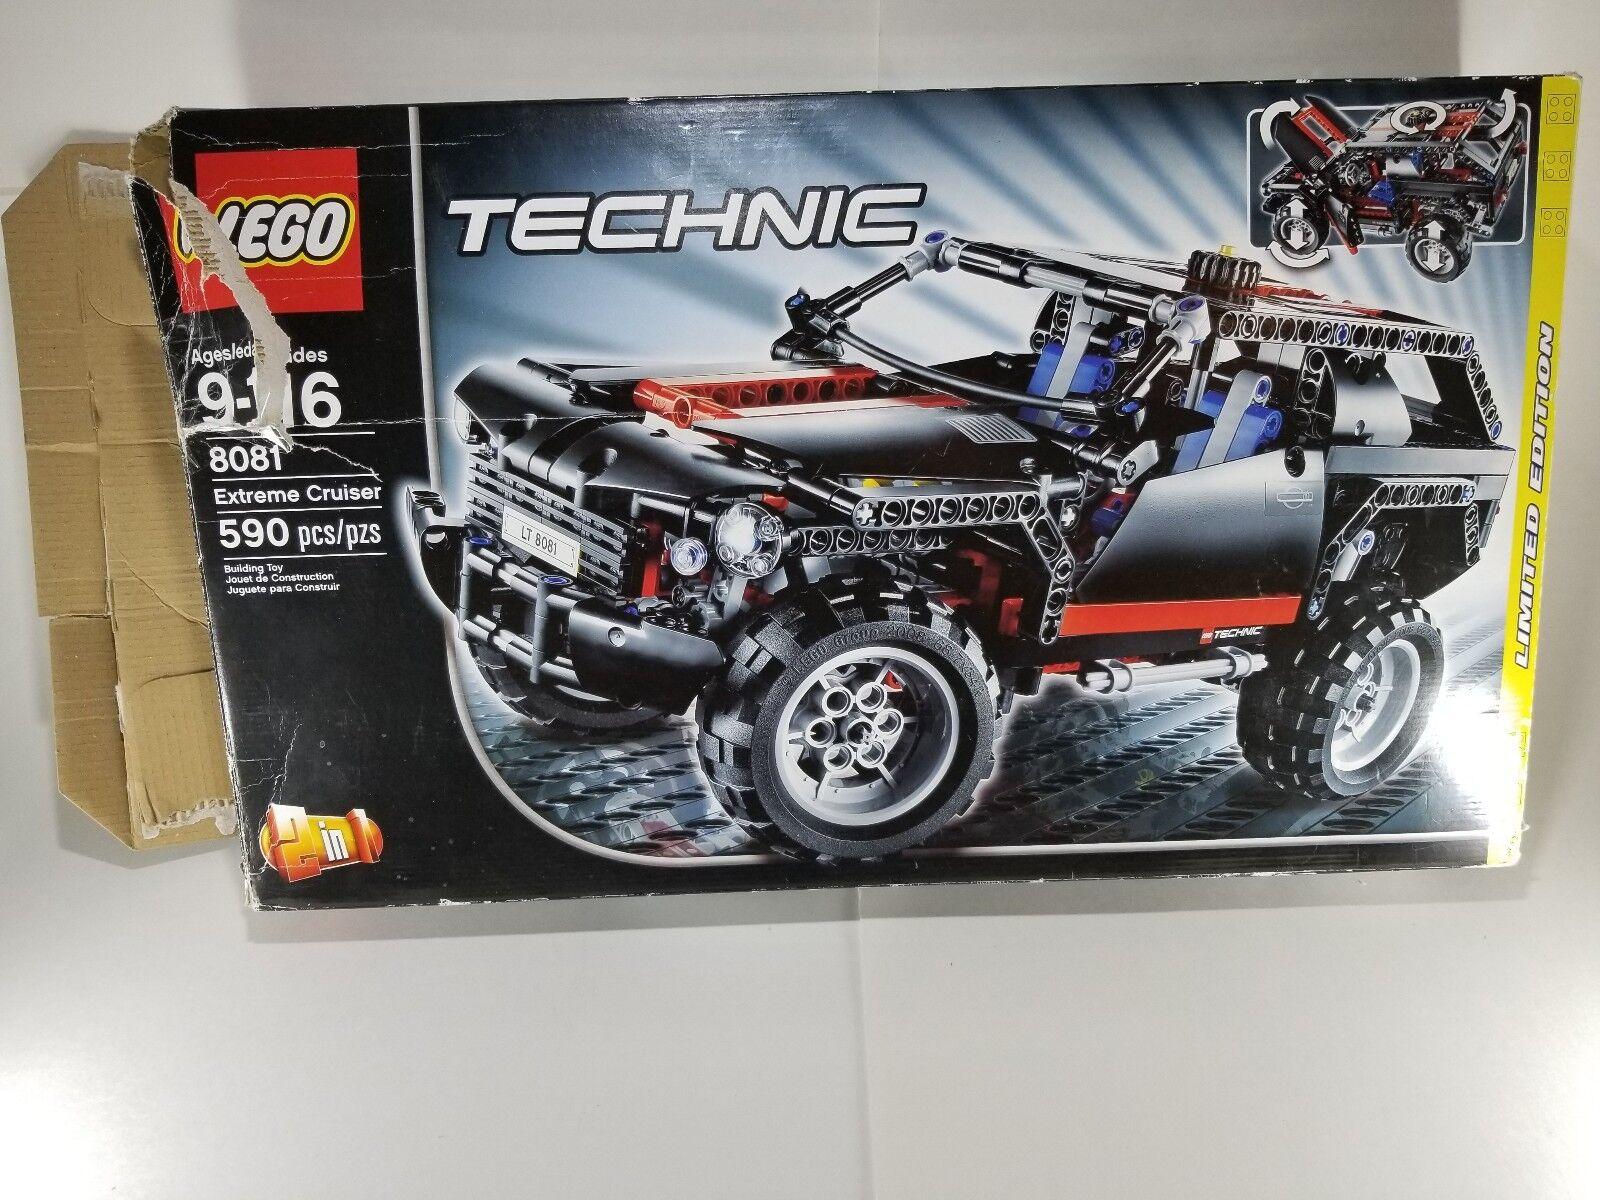 Lego Technic 80881 Extrem Cruise Ny öppen ruta saknas 1 -manual